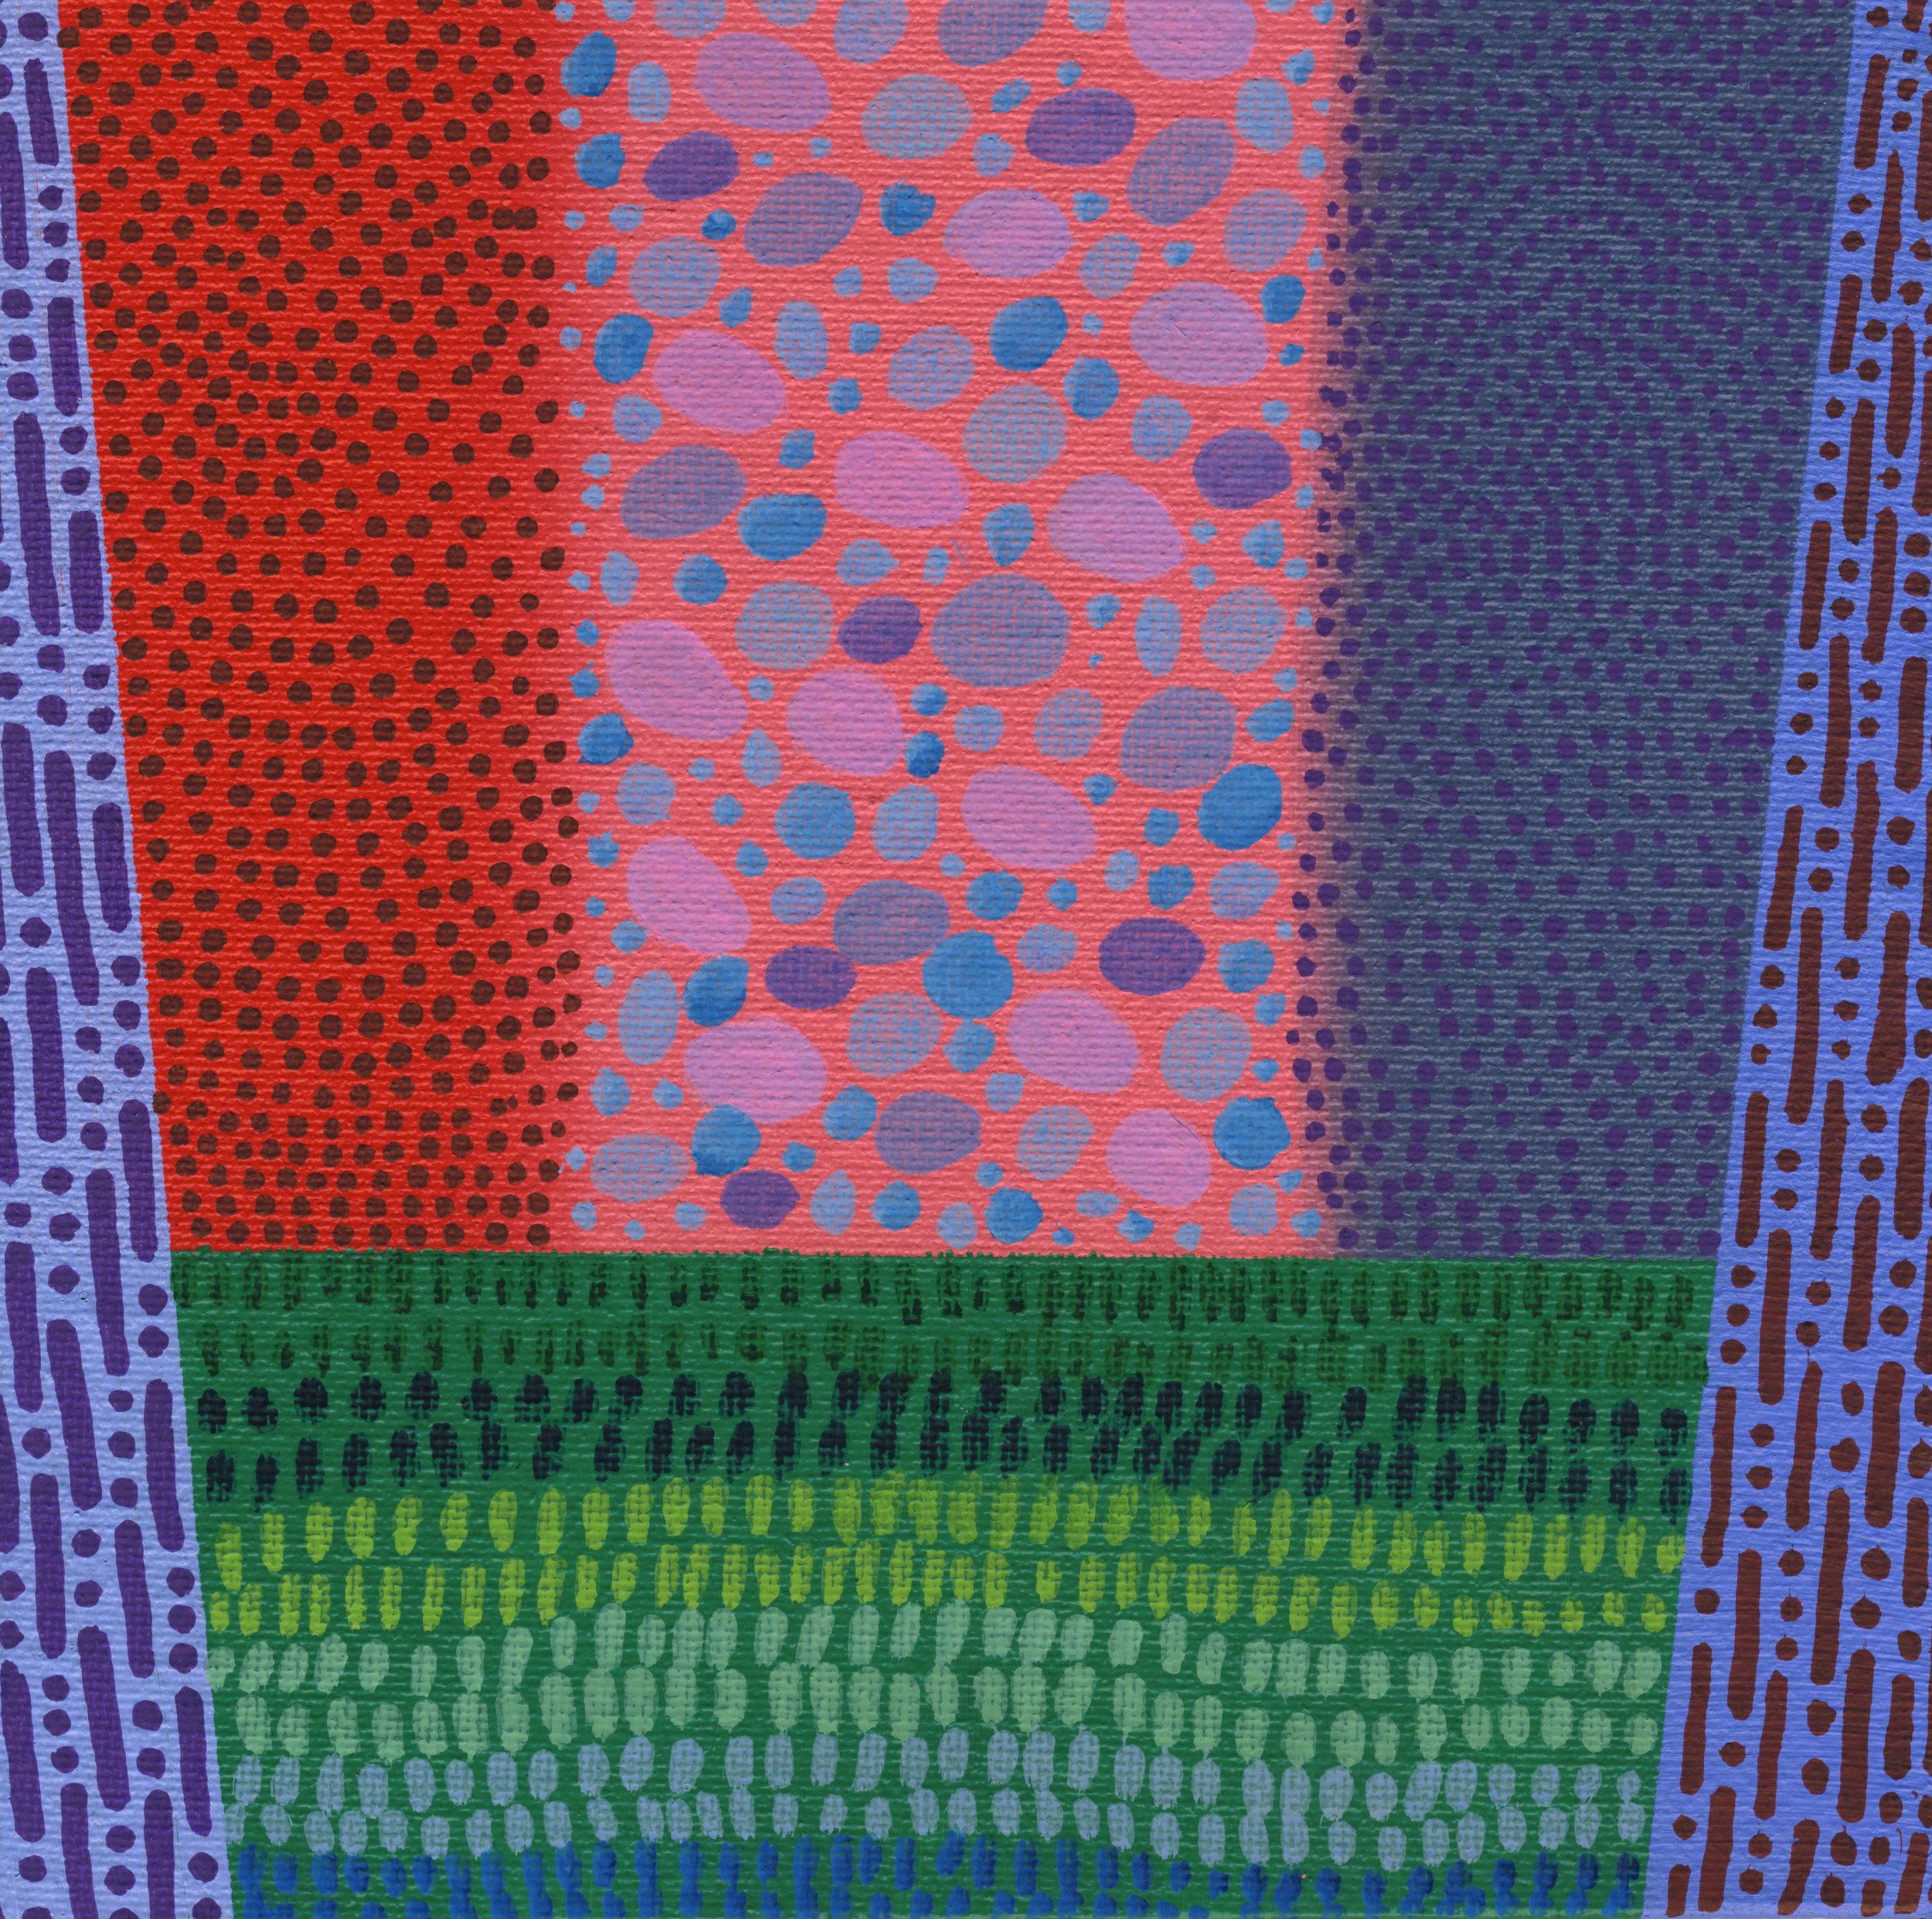 "77/100, Acrylic on canvas panel, 6"" X 6"", 3/24/19"